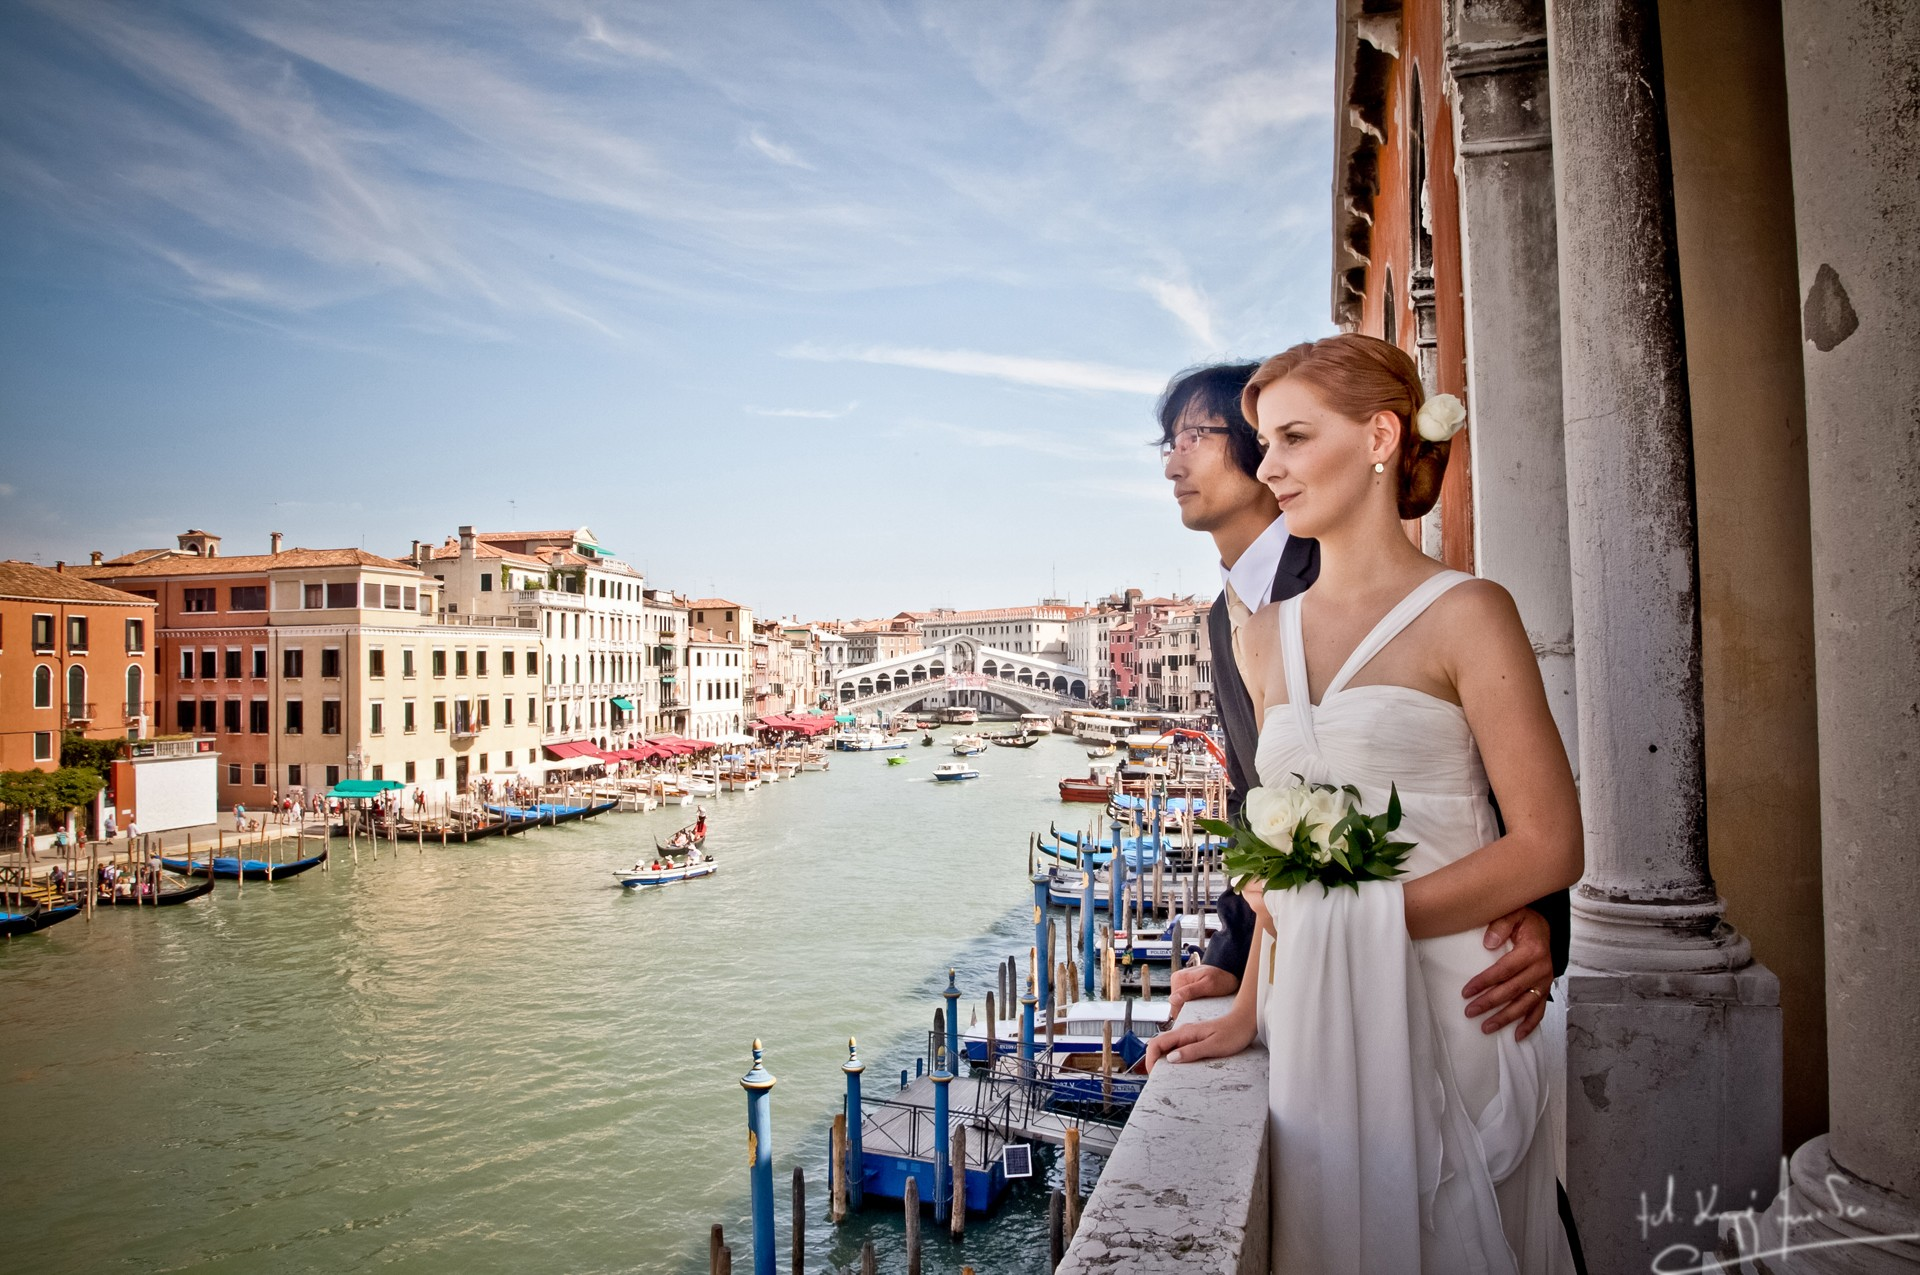 Ślub w wenecji 37 Manuela Luiza & Young Seon Song